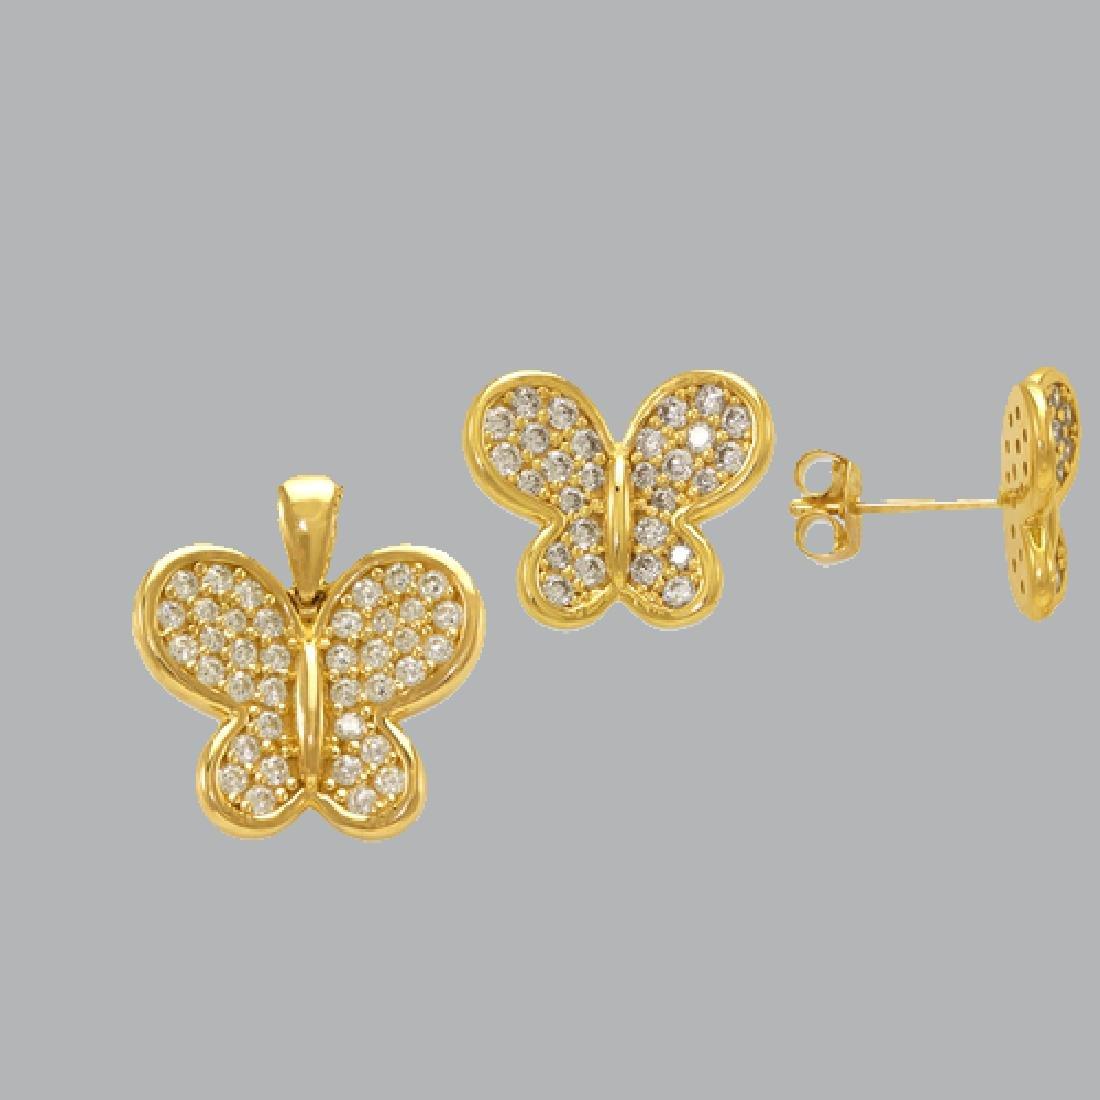 NEW 14K YELLOW GOLD BUTTERFLY EARRING PENDANT SET - 2